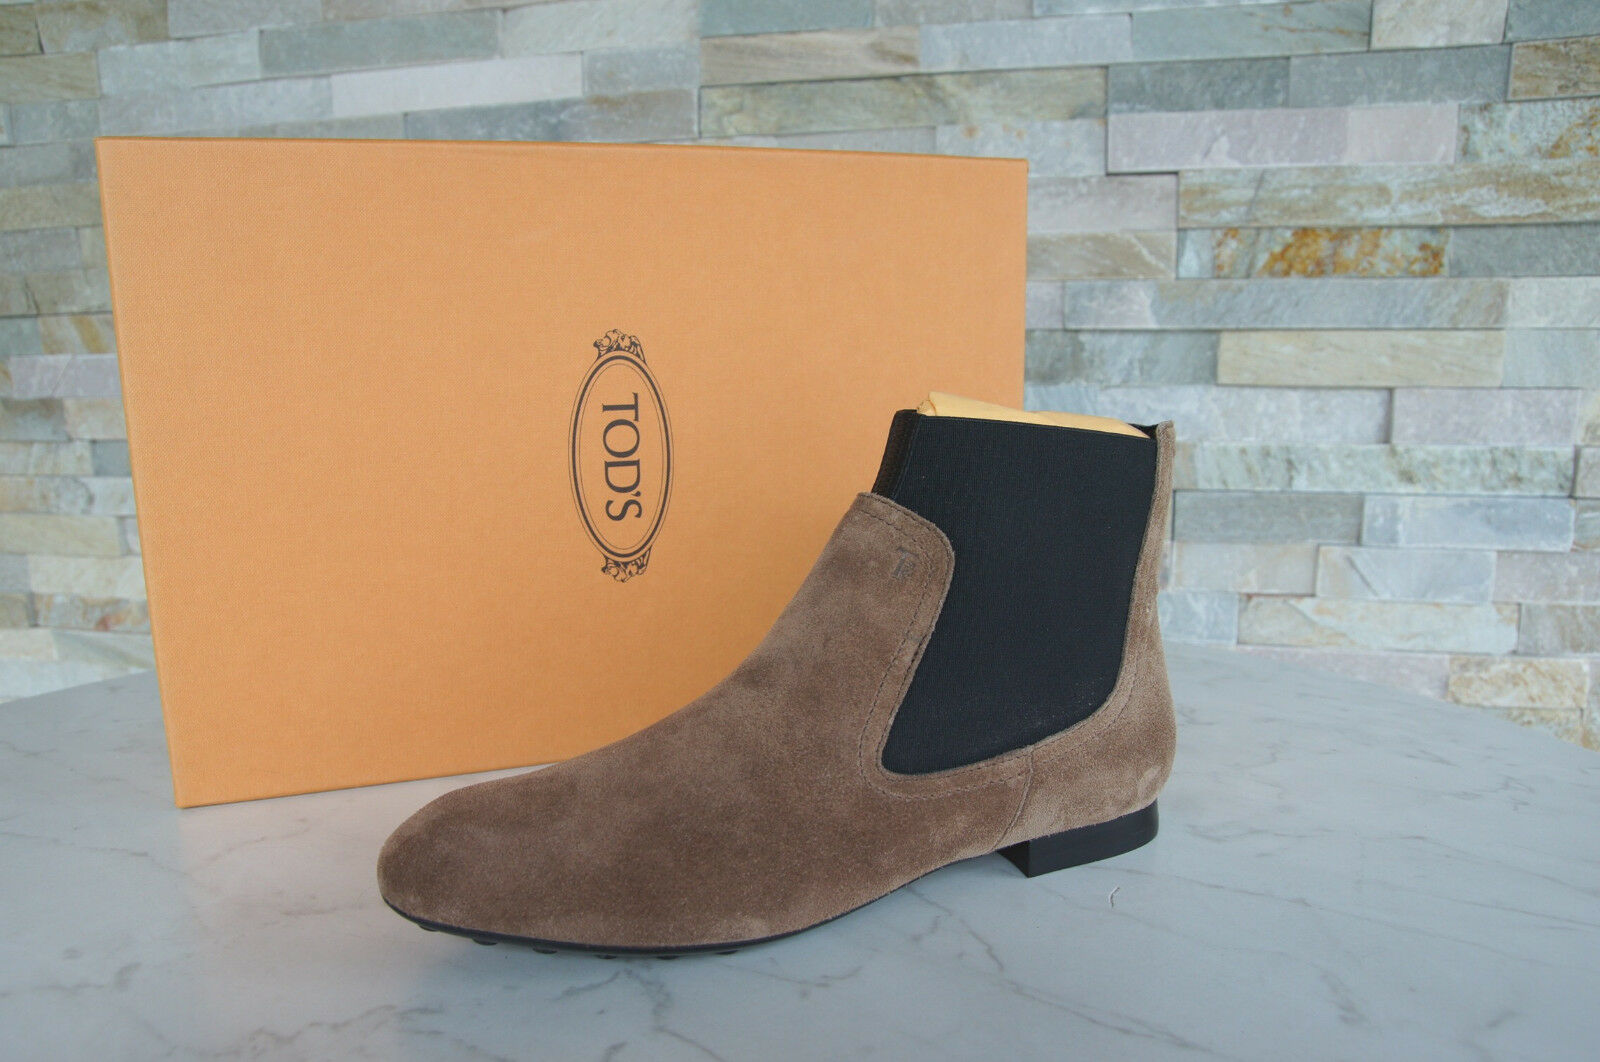 Tods Tod´s Stiefeletten 36,5 Ankle Stiefelies Stiefel Schuhe braun neu ehem